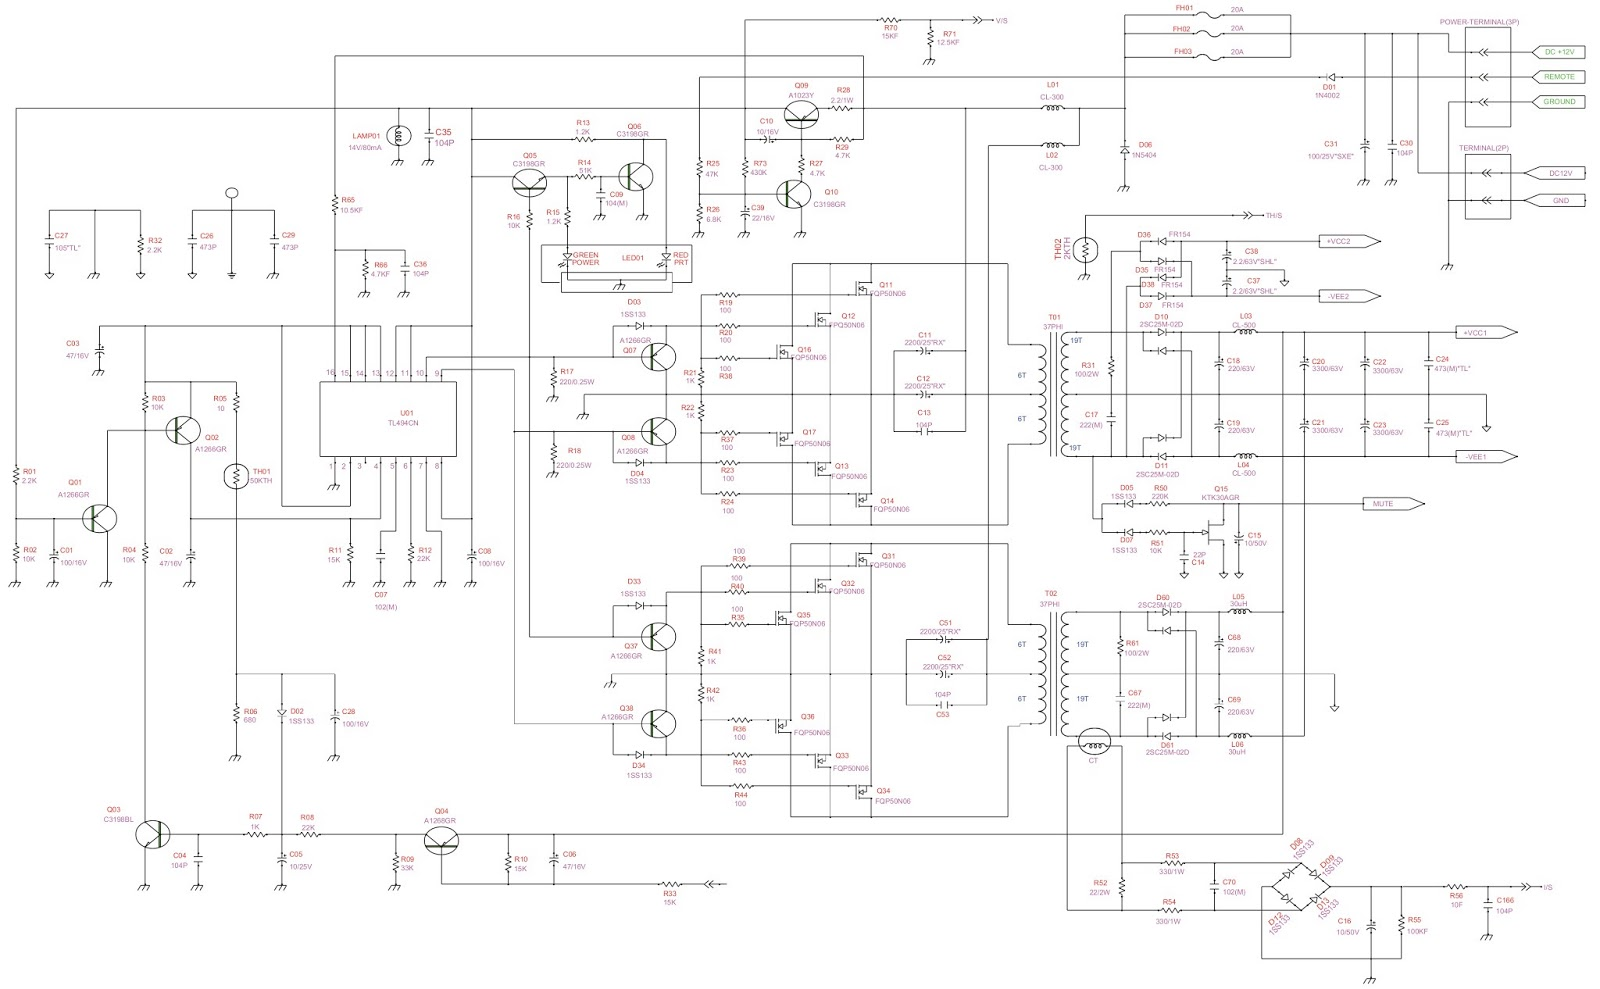 medium resolution of manualguide alpine 2 channel amp wire diagram rh whizenterprise co uk